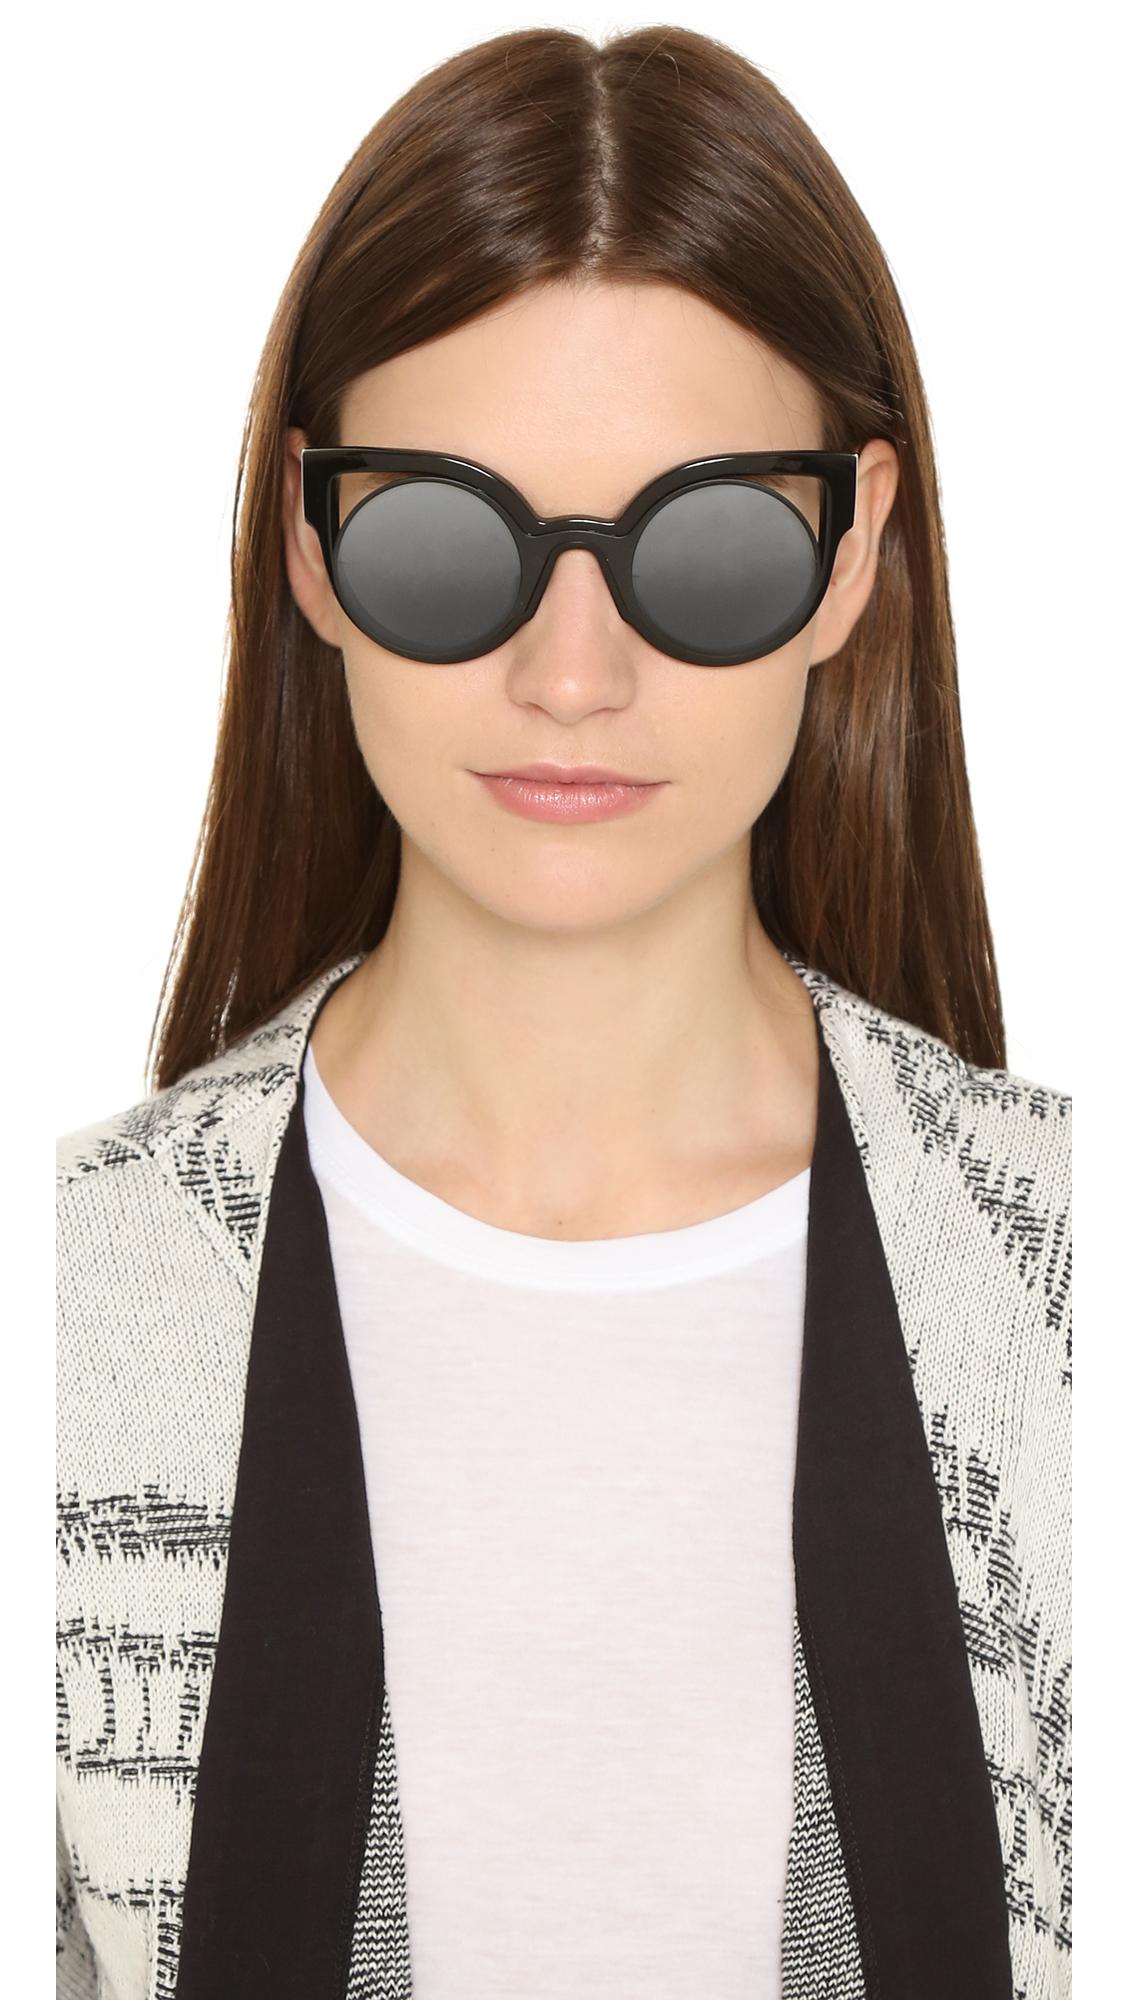 30881942ab6a Fendi Round Cutout Sunglasses in Black - Lyst